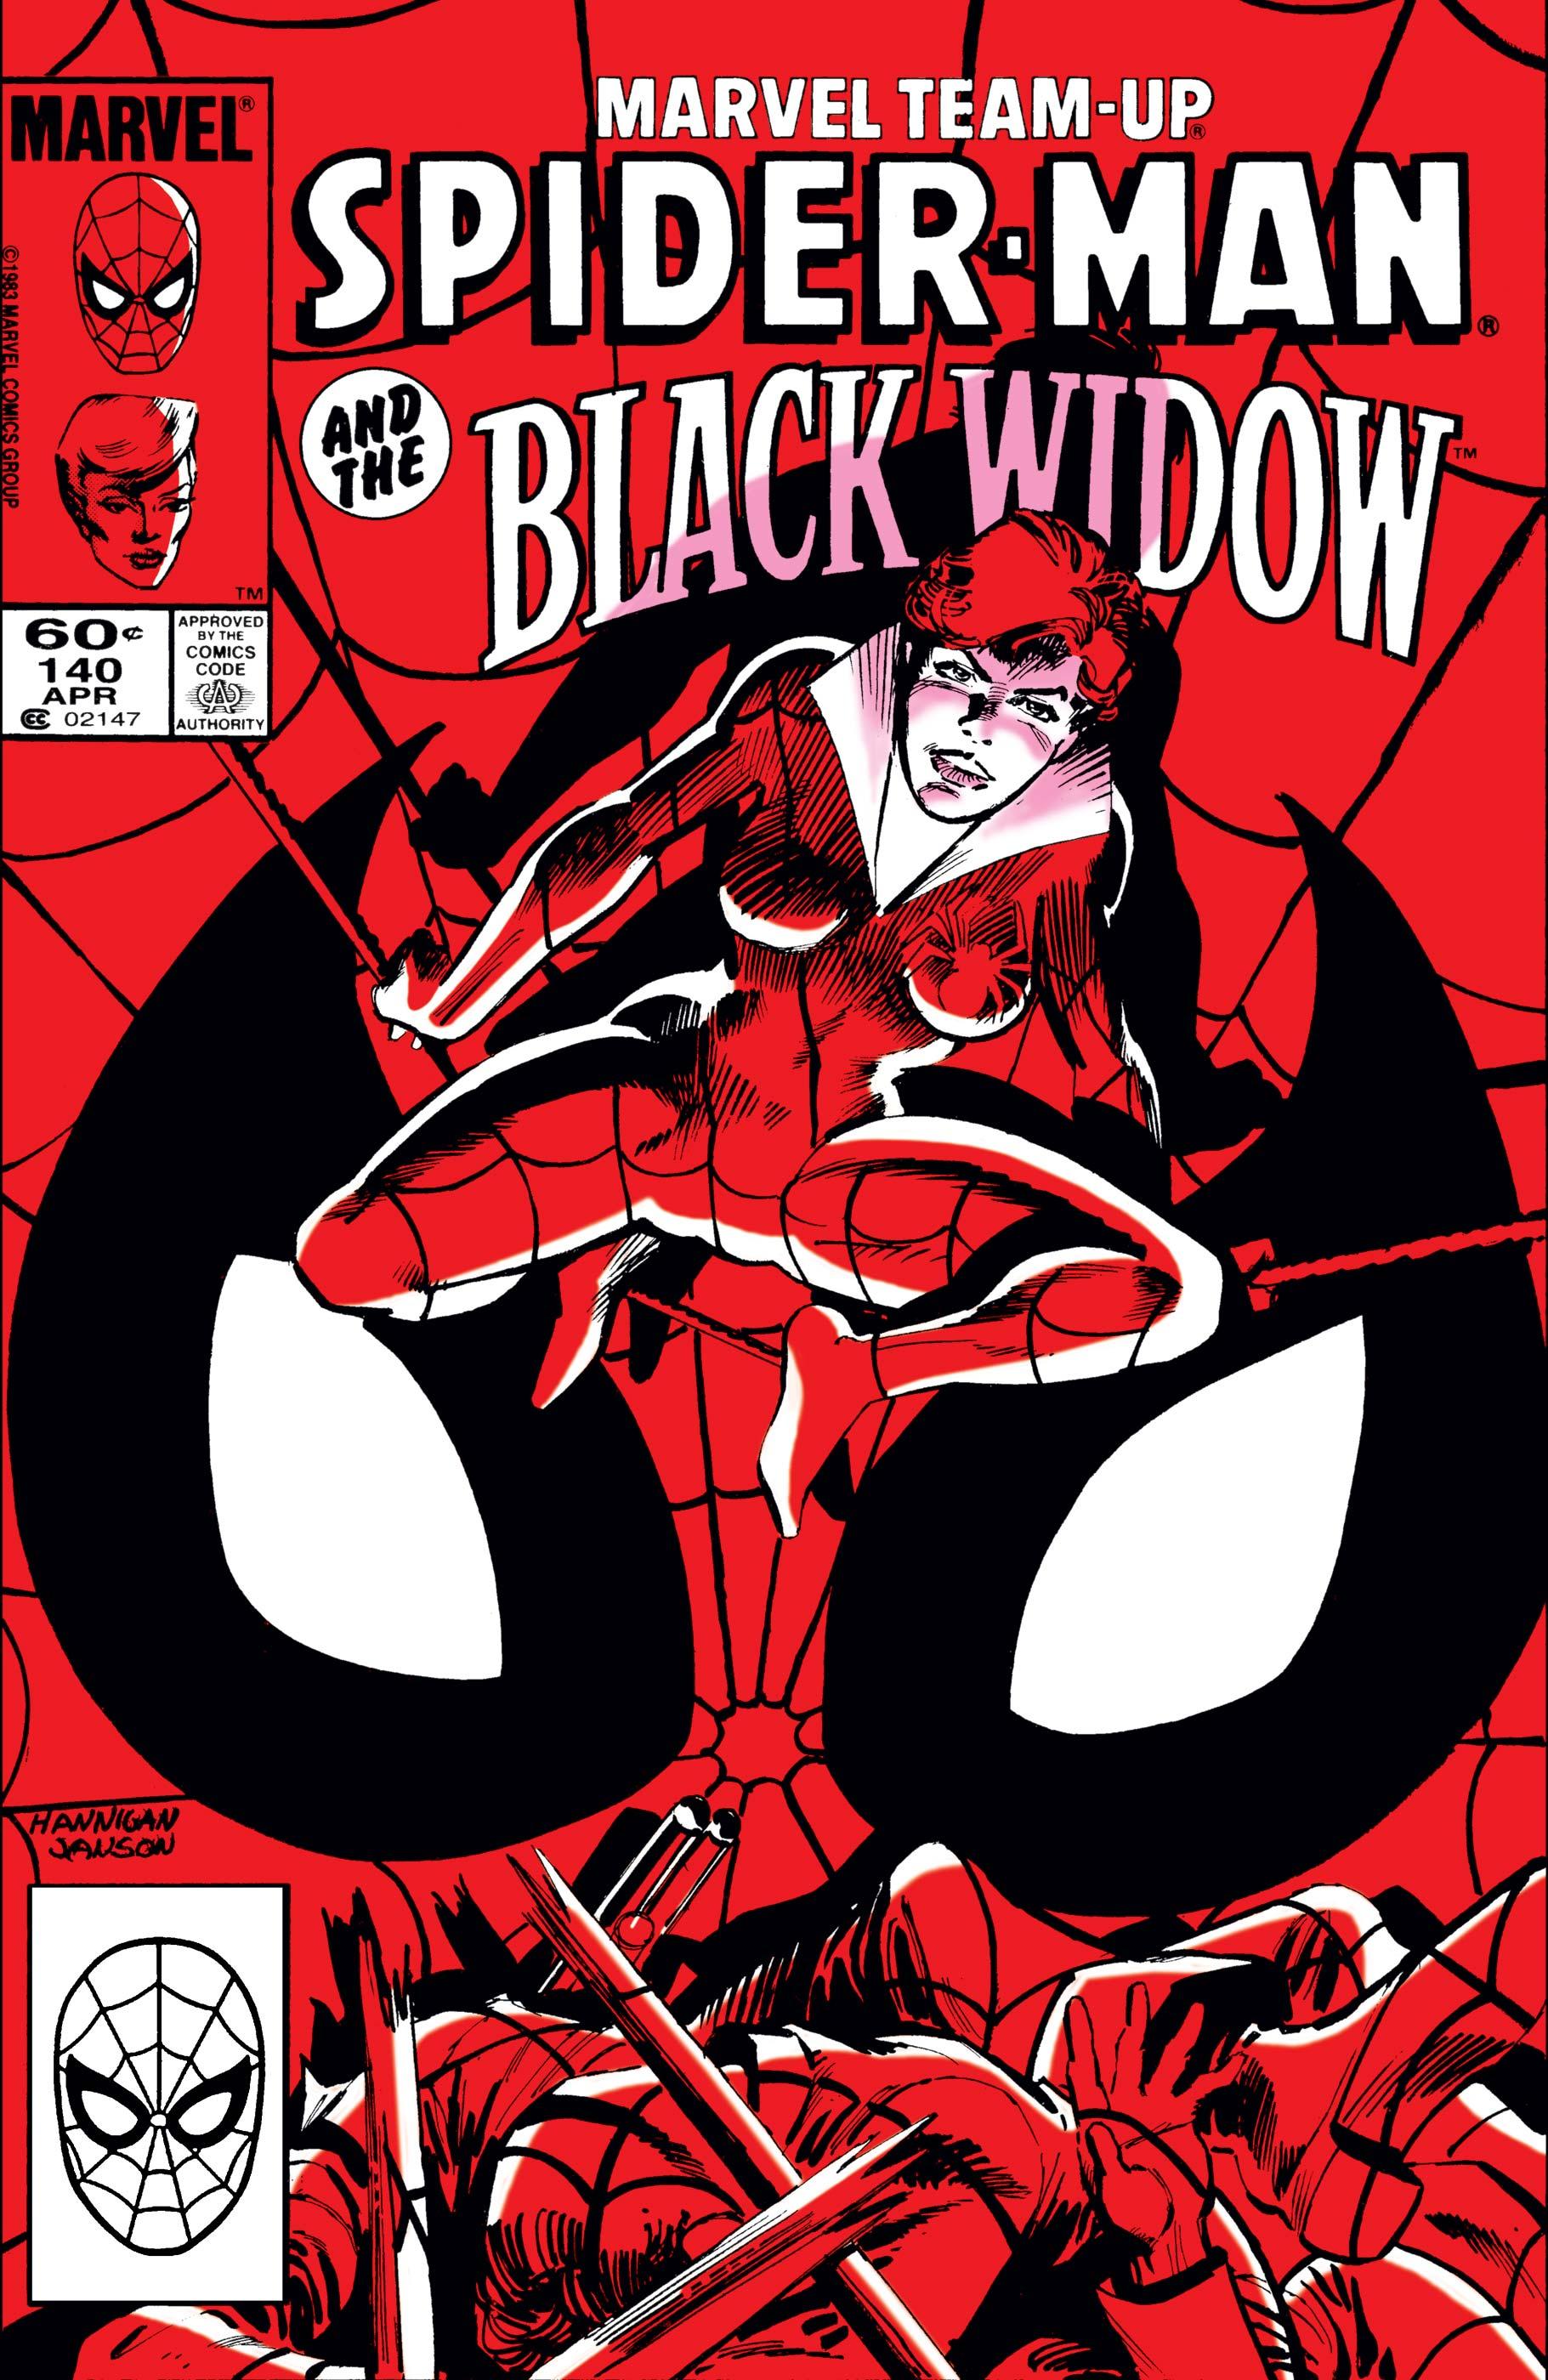 Marvel Team-Up (1972) #140